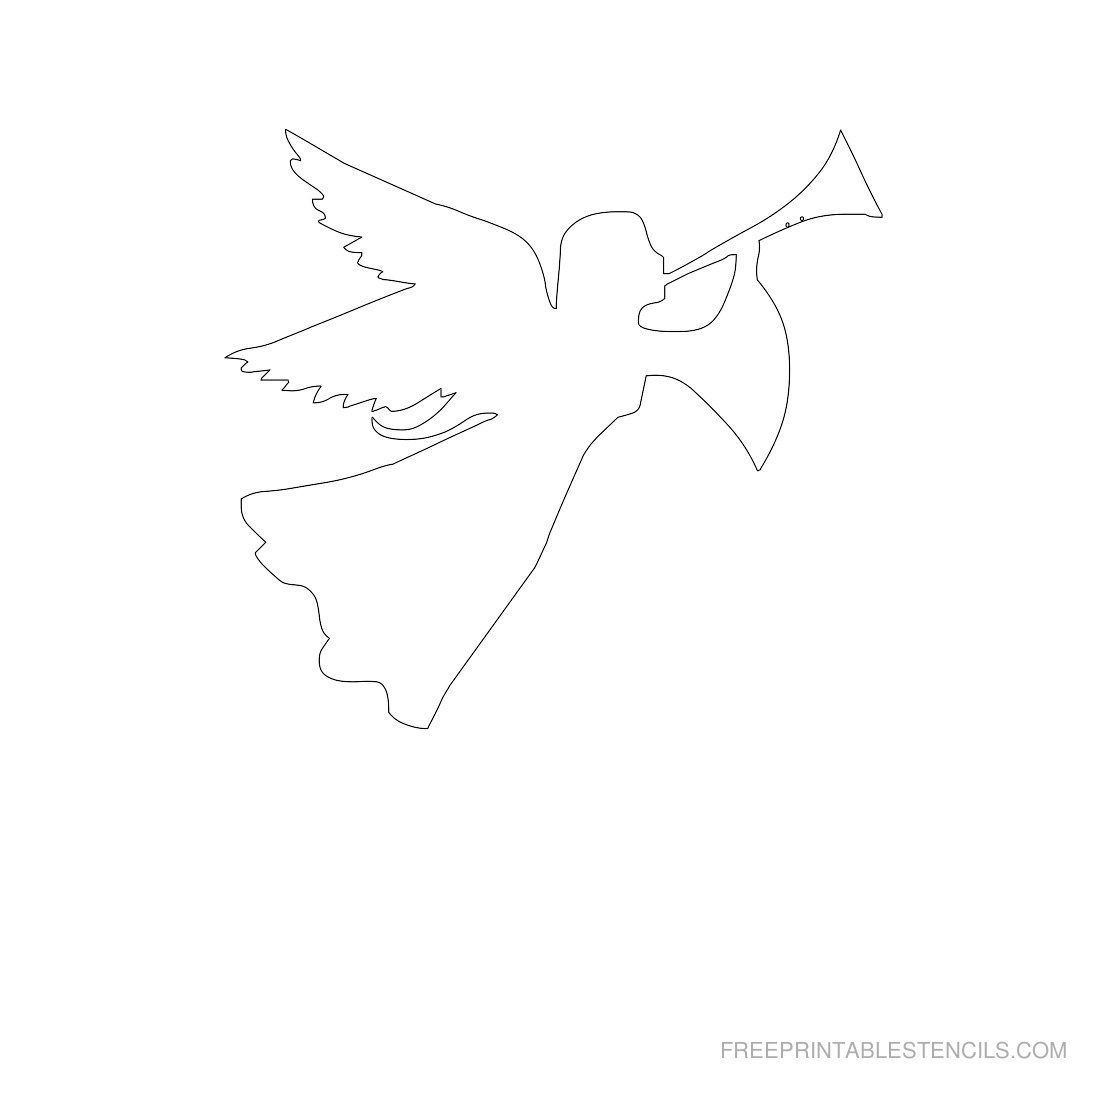 Pinstephanie Bargelski On Angels | Pinterest | Free Stencils - Free Printable Angels